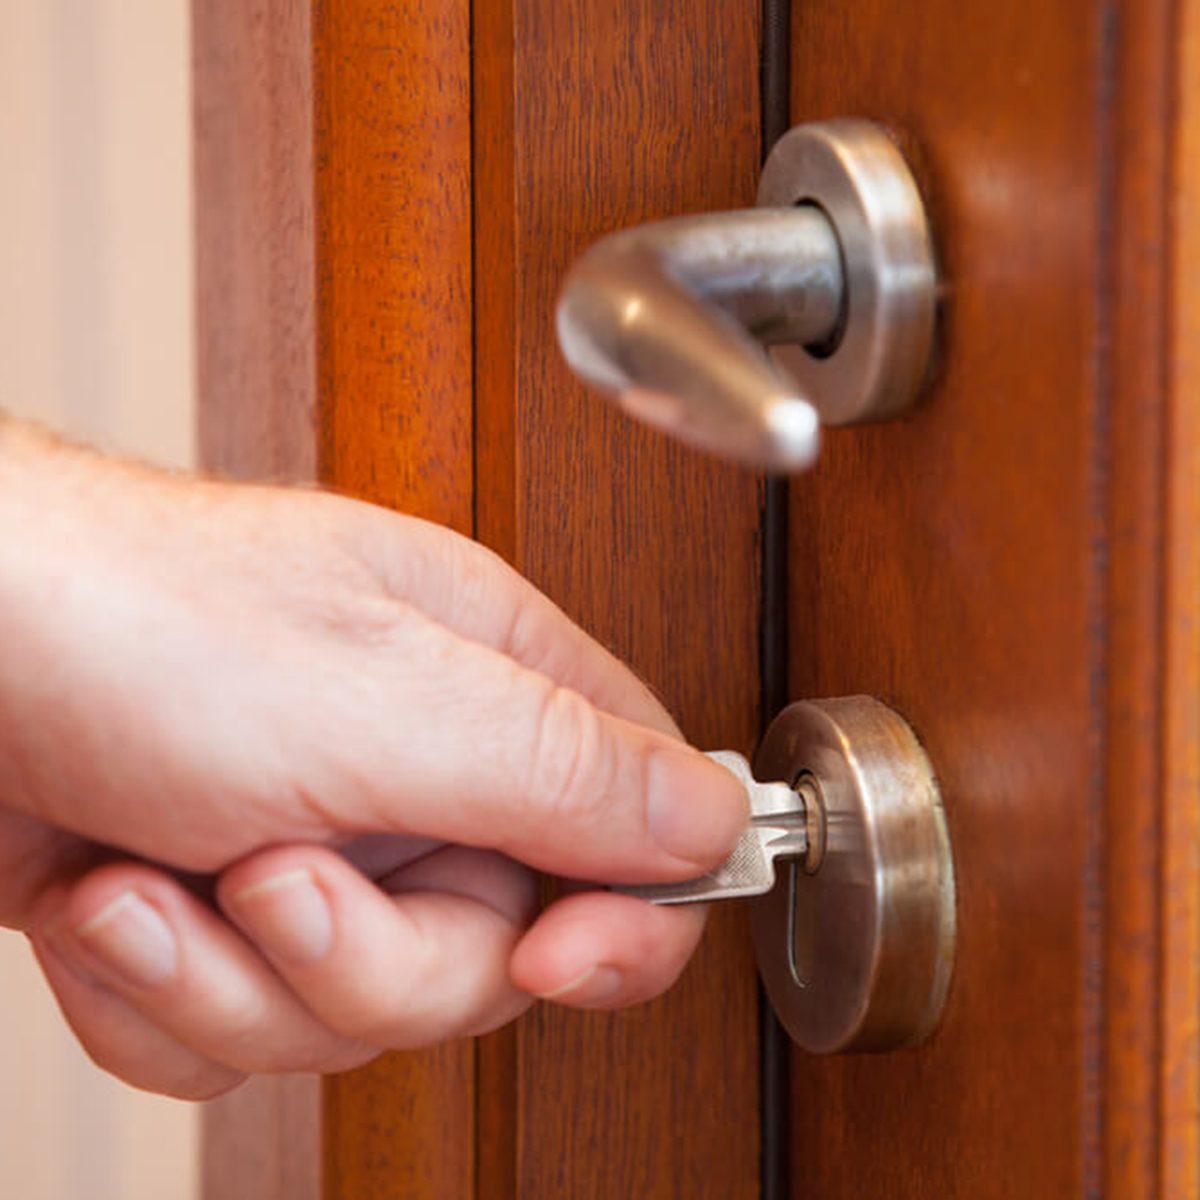 Putting key in lock